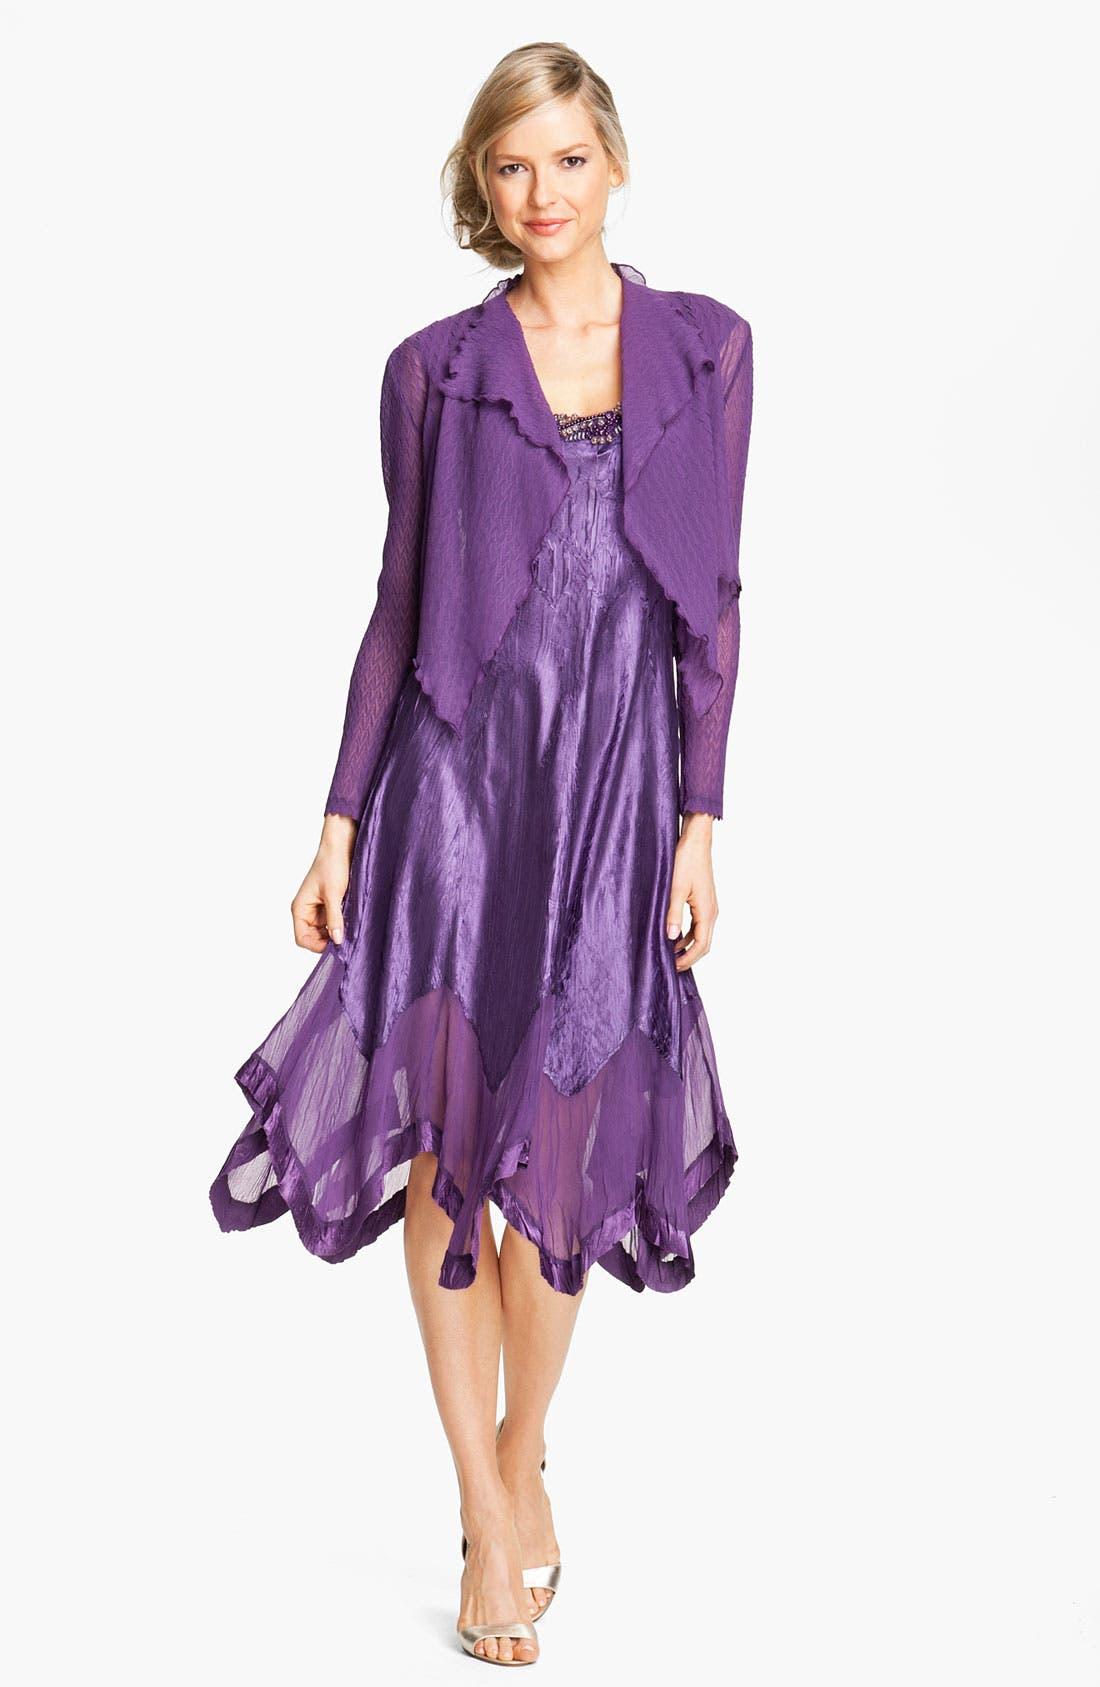 Main Image - Komarov Handkerchief Hem Charmeuse Dress & Chiffon Jacket (Regular & Petite)